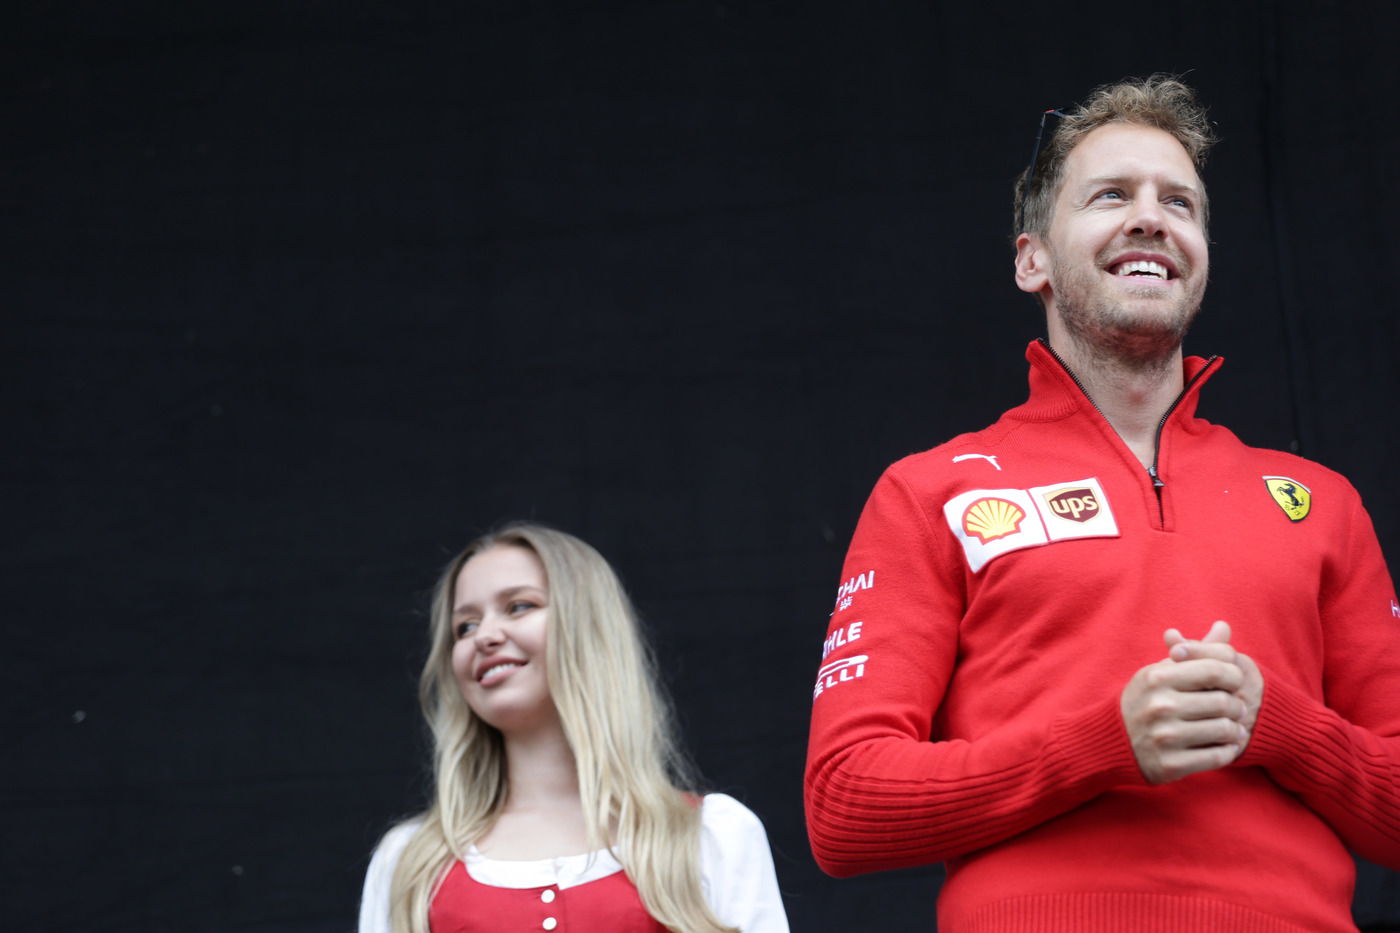 F1, Gp Austria: Bottas davanti a tutti, vittoria a 2,05